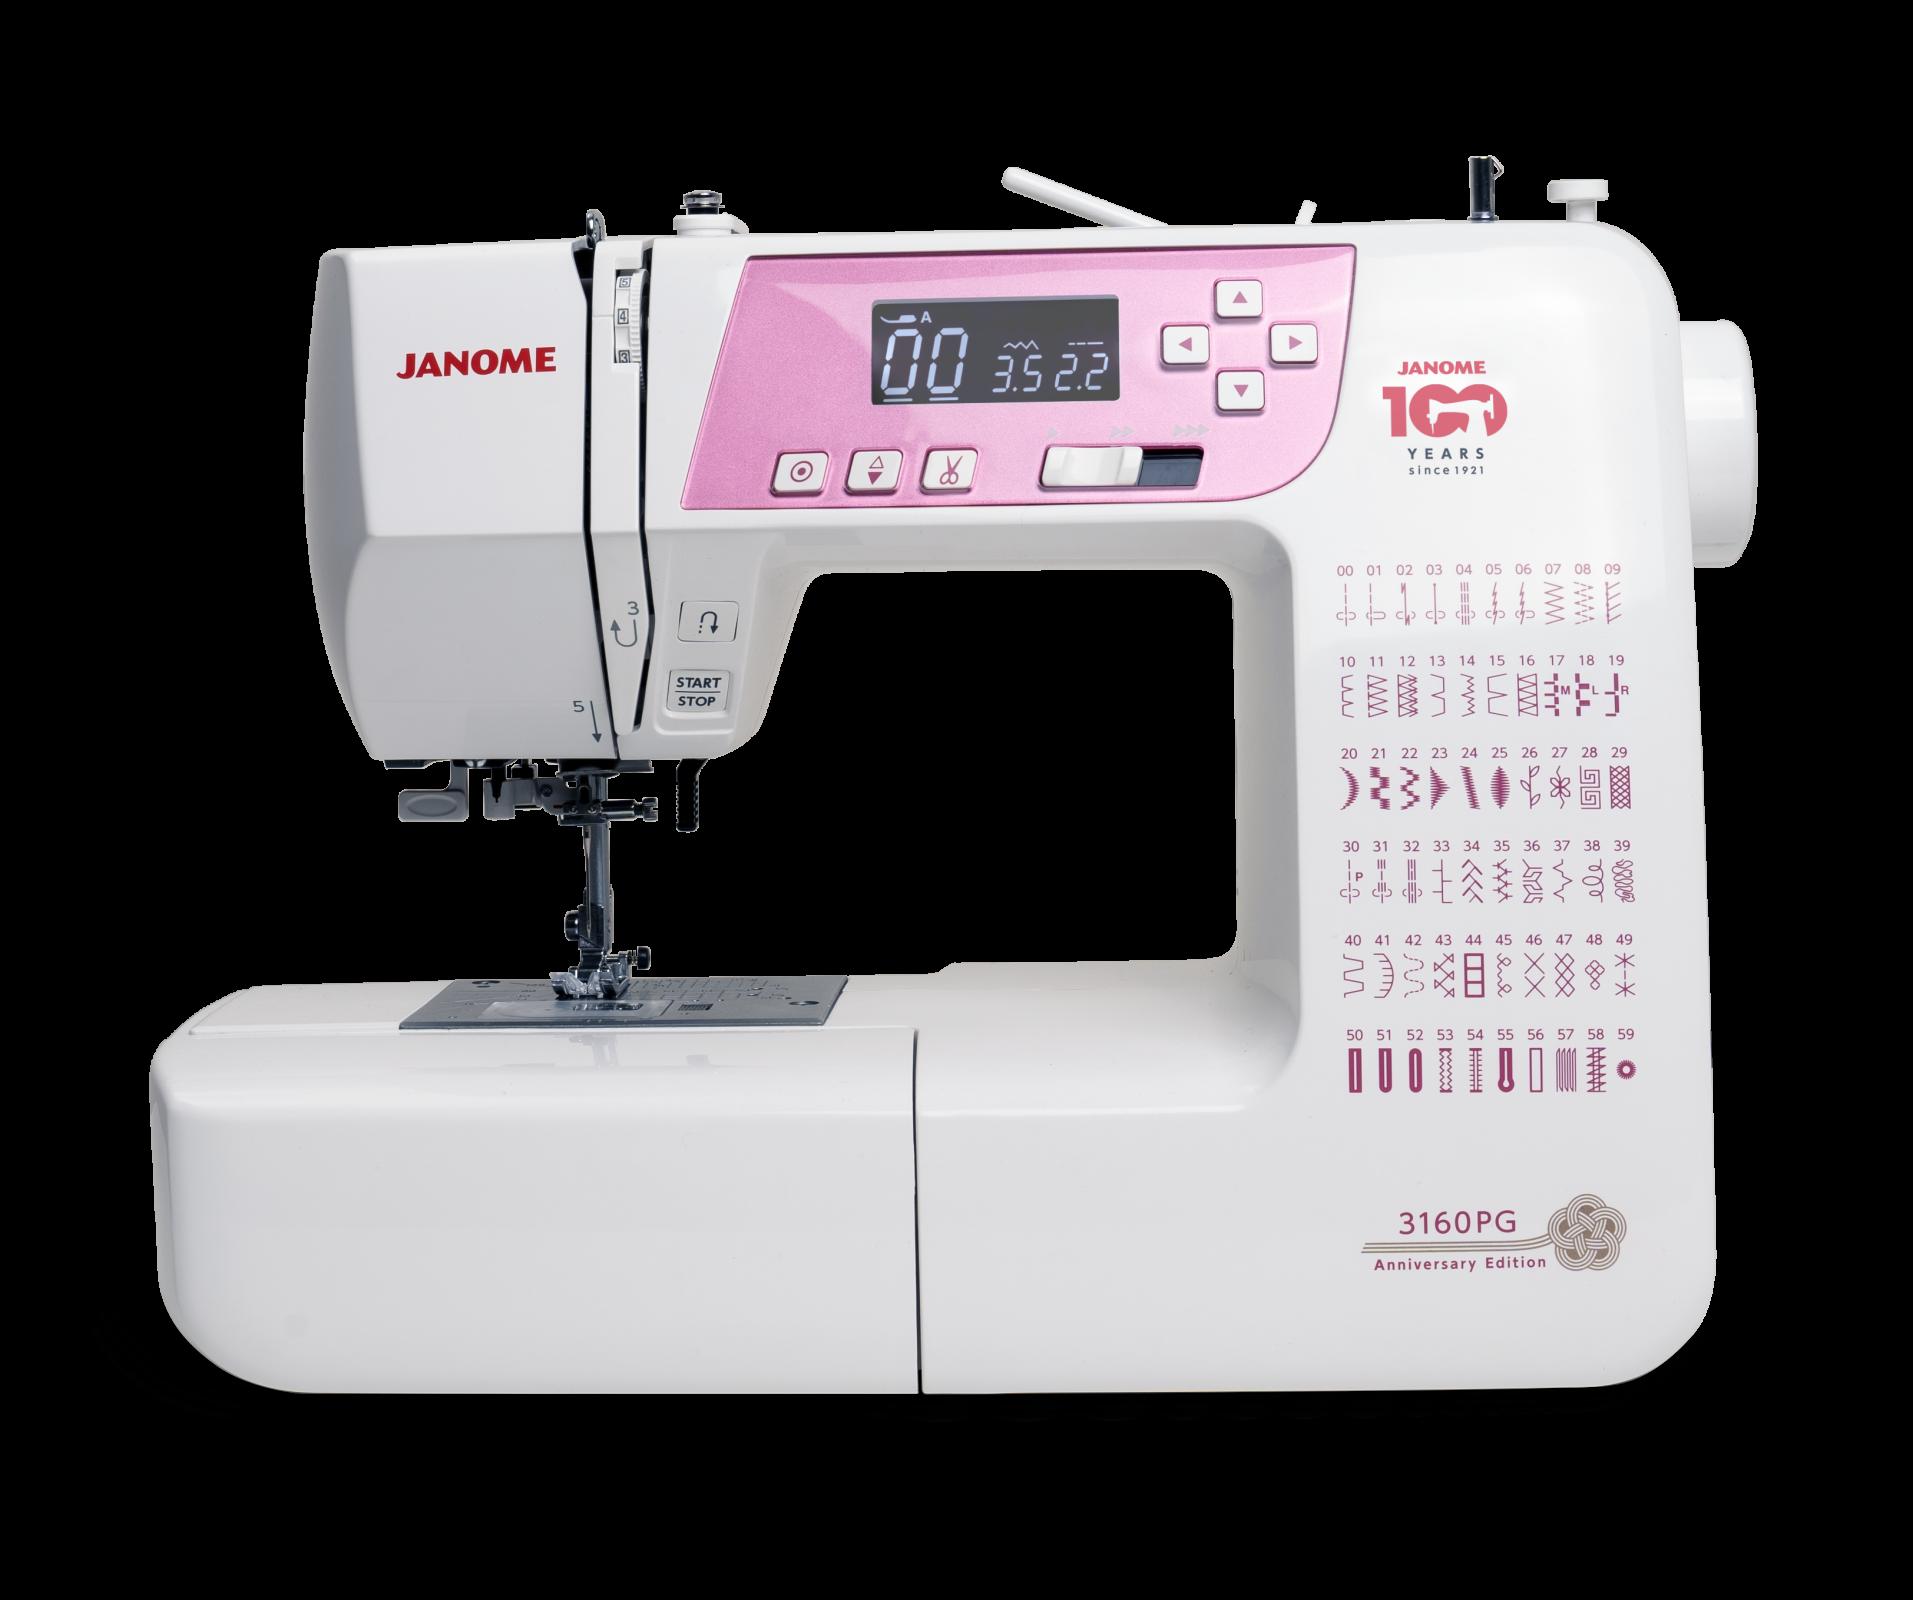 Janome 3160PG Sewing Machine